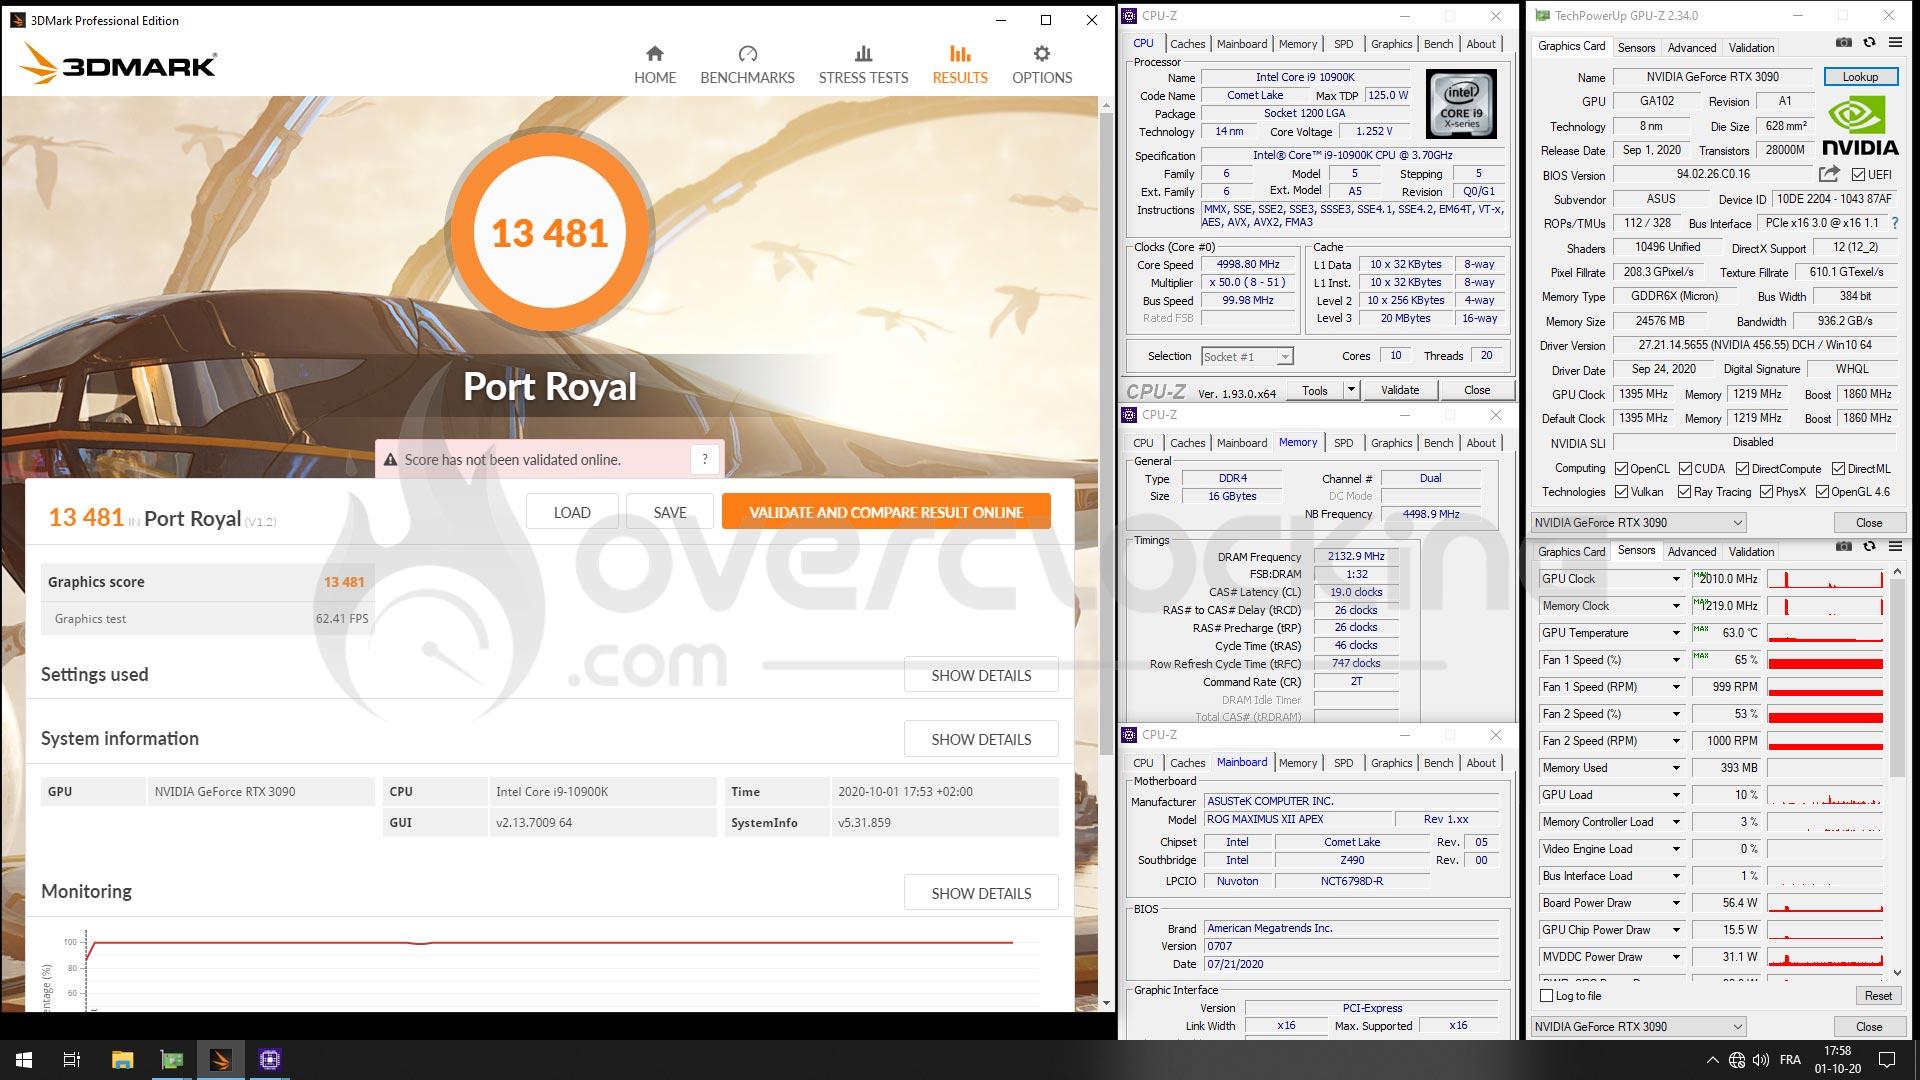 Port Royal Asus RTX 3090 Strix OC